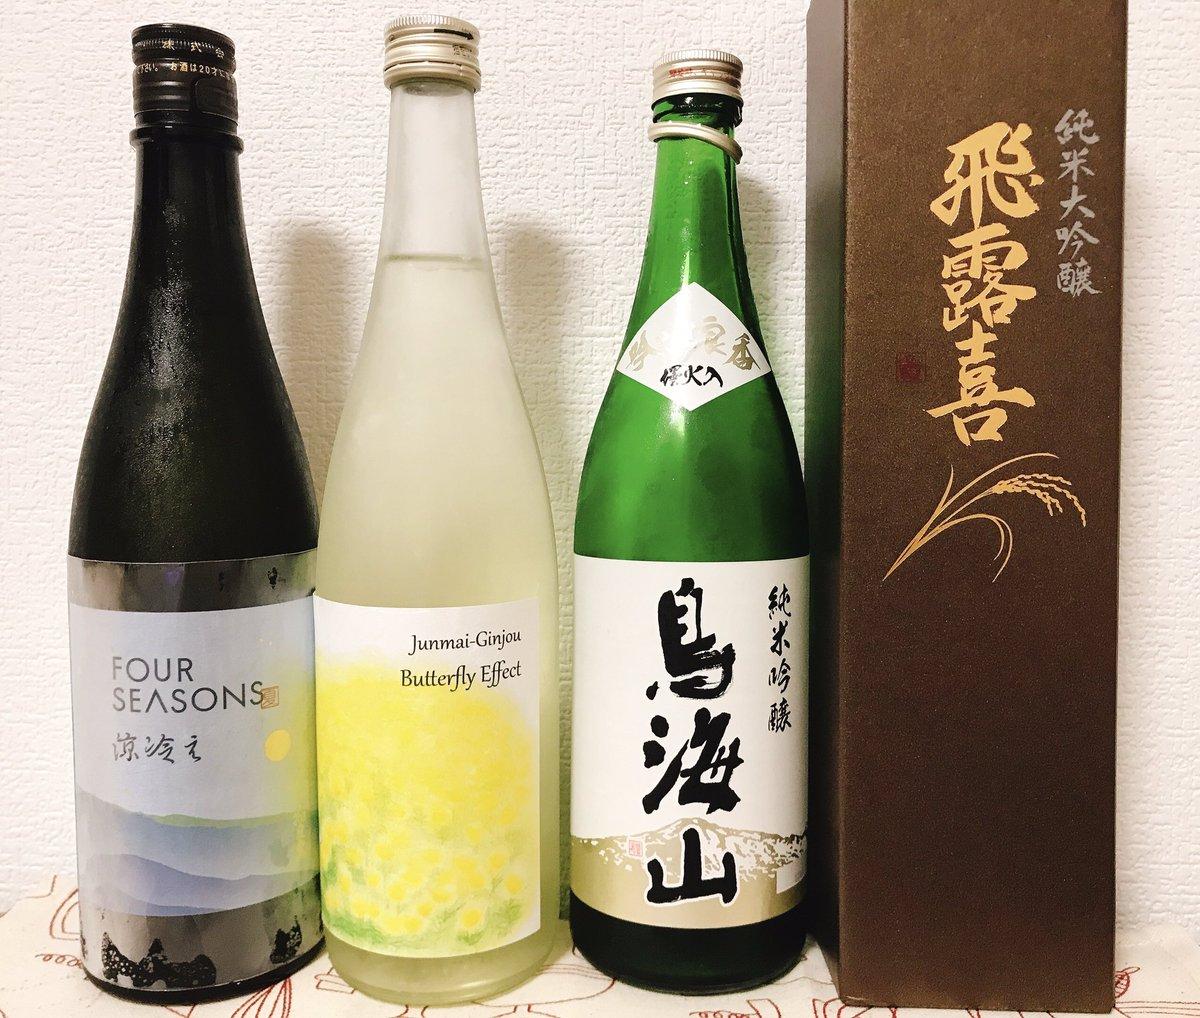 test ツイッターメディア - 最近買った日本酒たち‼️😆 飛露喜の浮き具合よ…🤔  #日本酒 #日本酒好きな人と繋がりたい #天寿 #福小町 #飛良泉 #飛露喜 https://t.co/s2p8FzSyu7